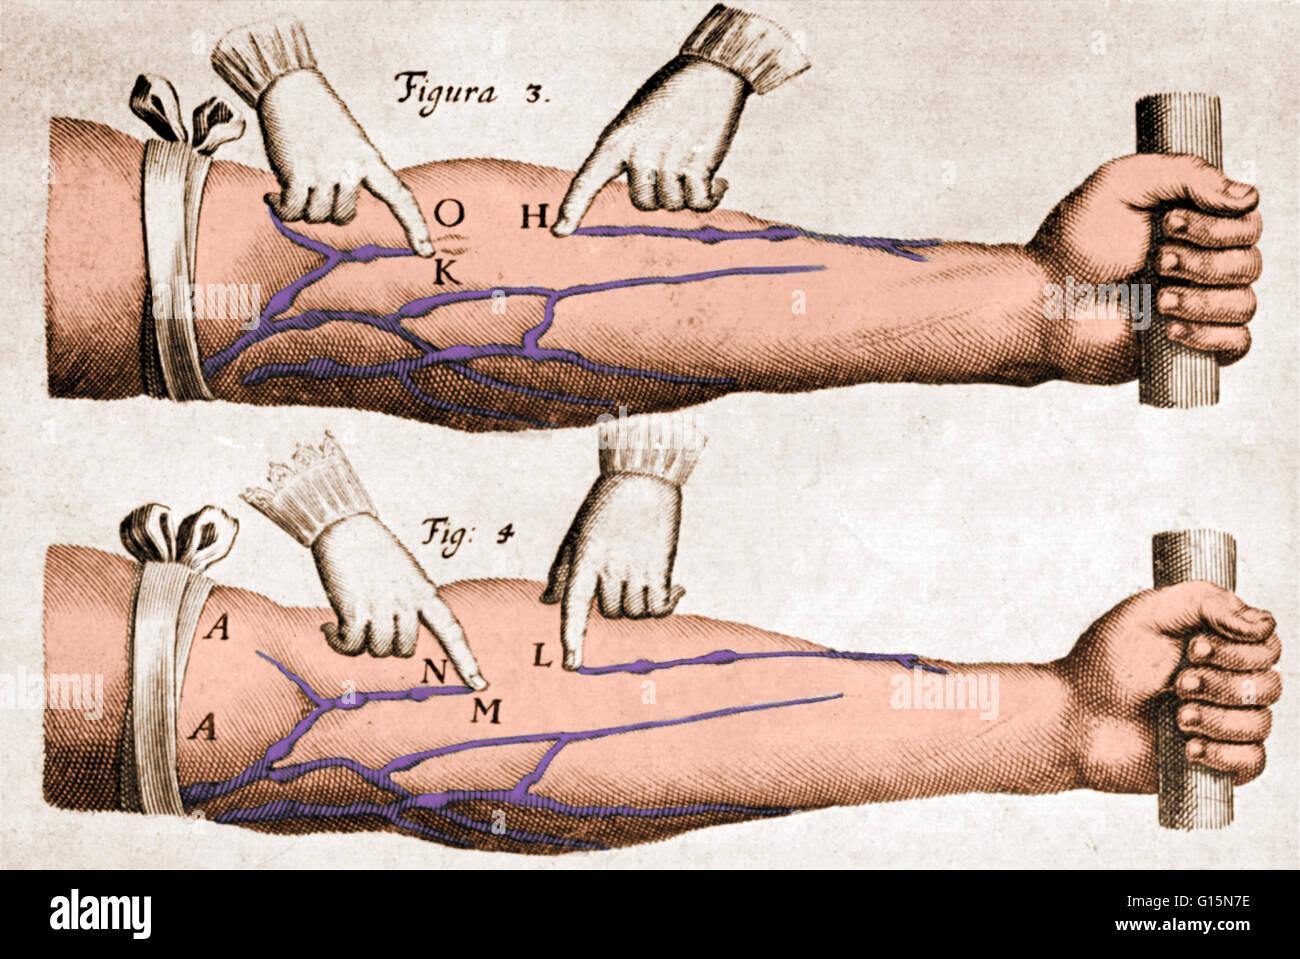 William Harvey Anatomy Stock Photos & William Harvey Anatomy Stock ...